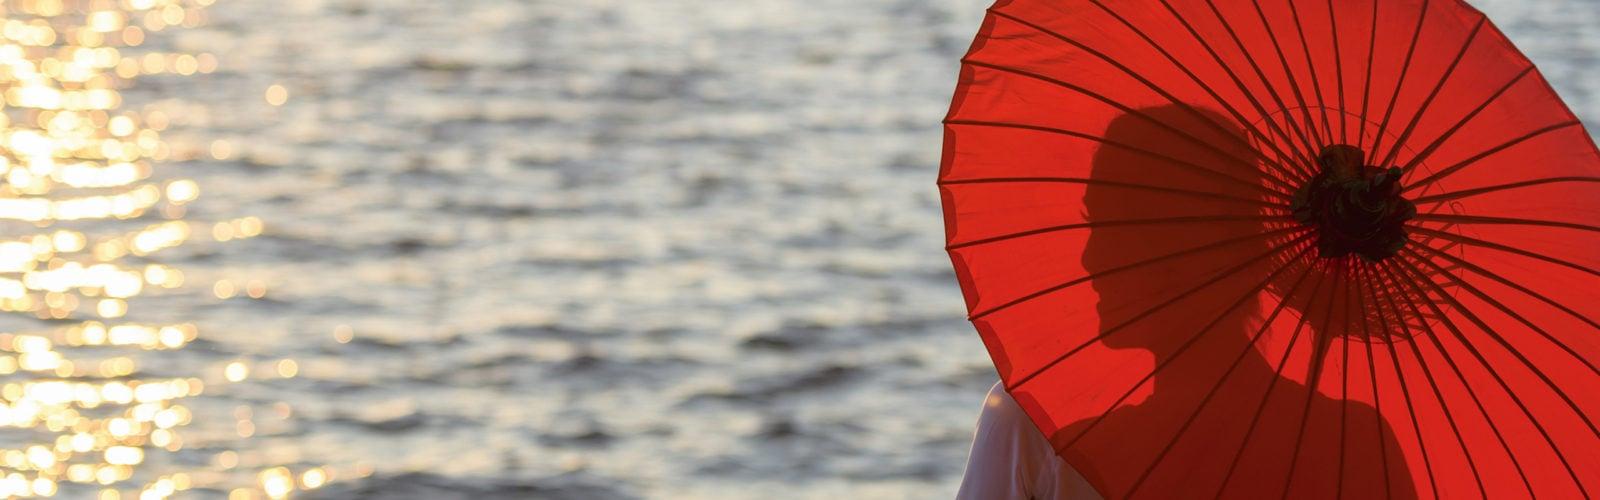 vietnamese-umbrella